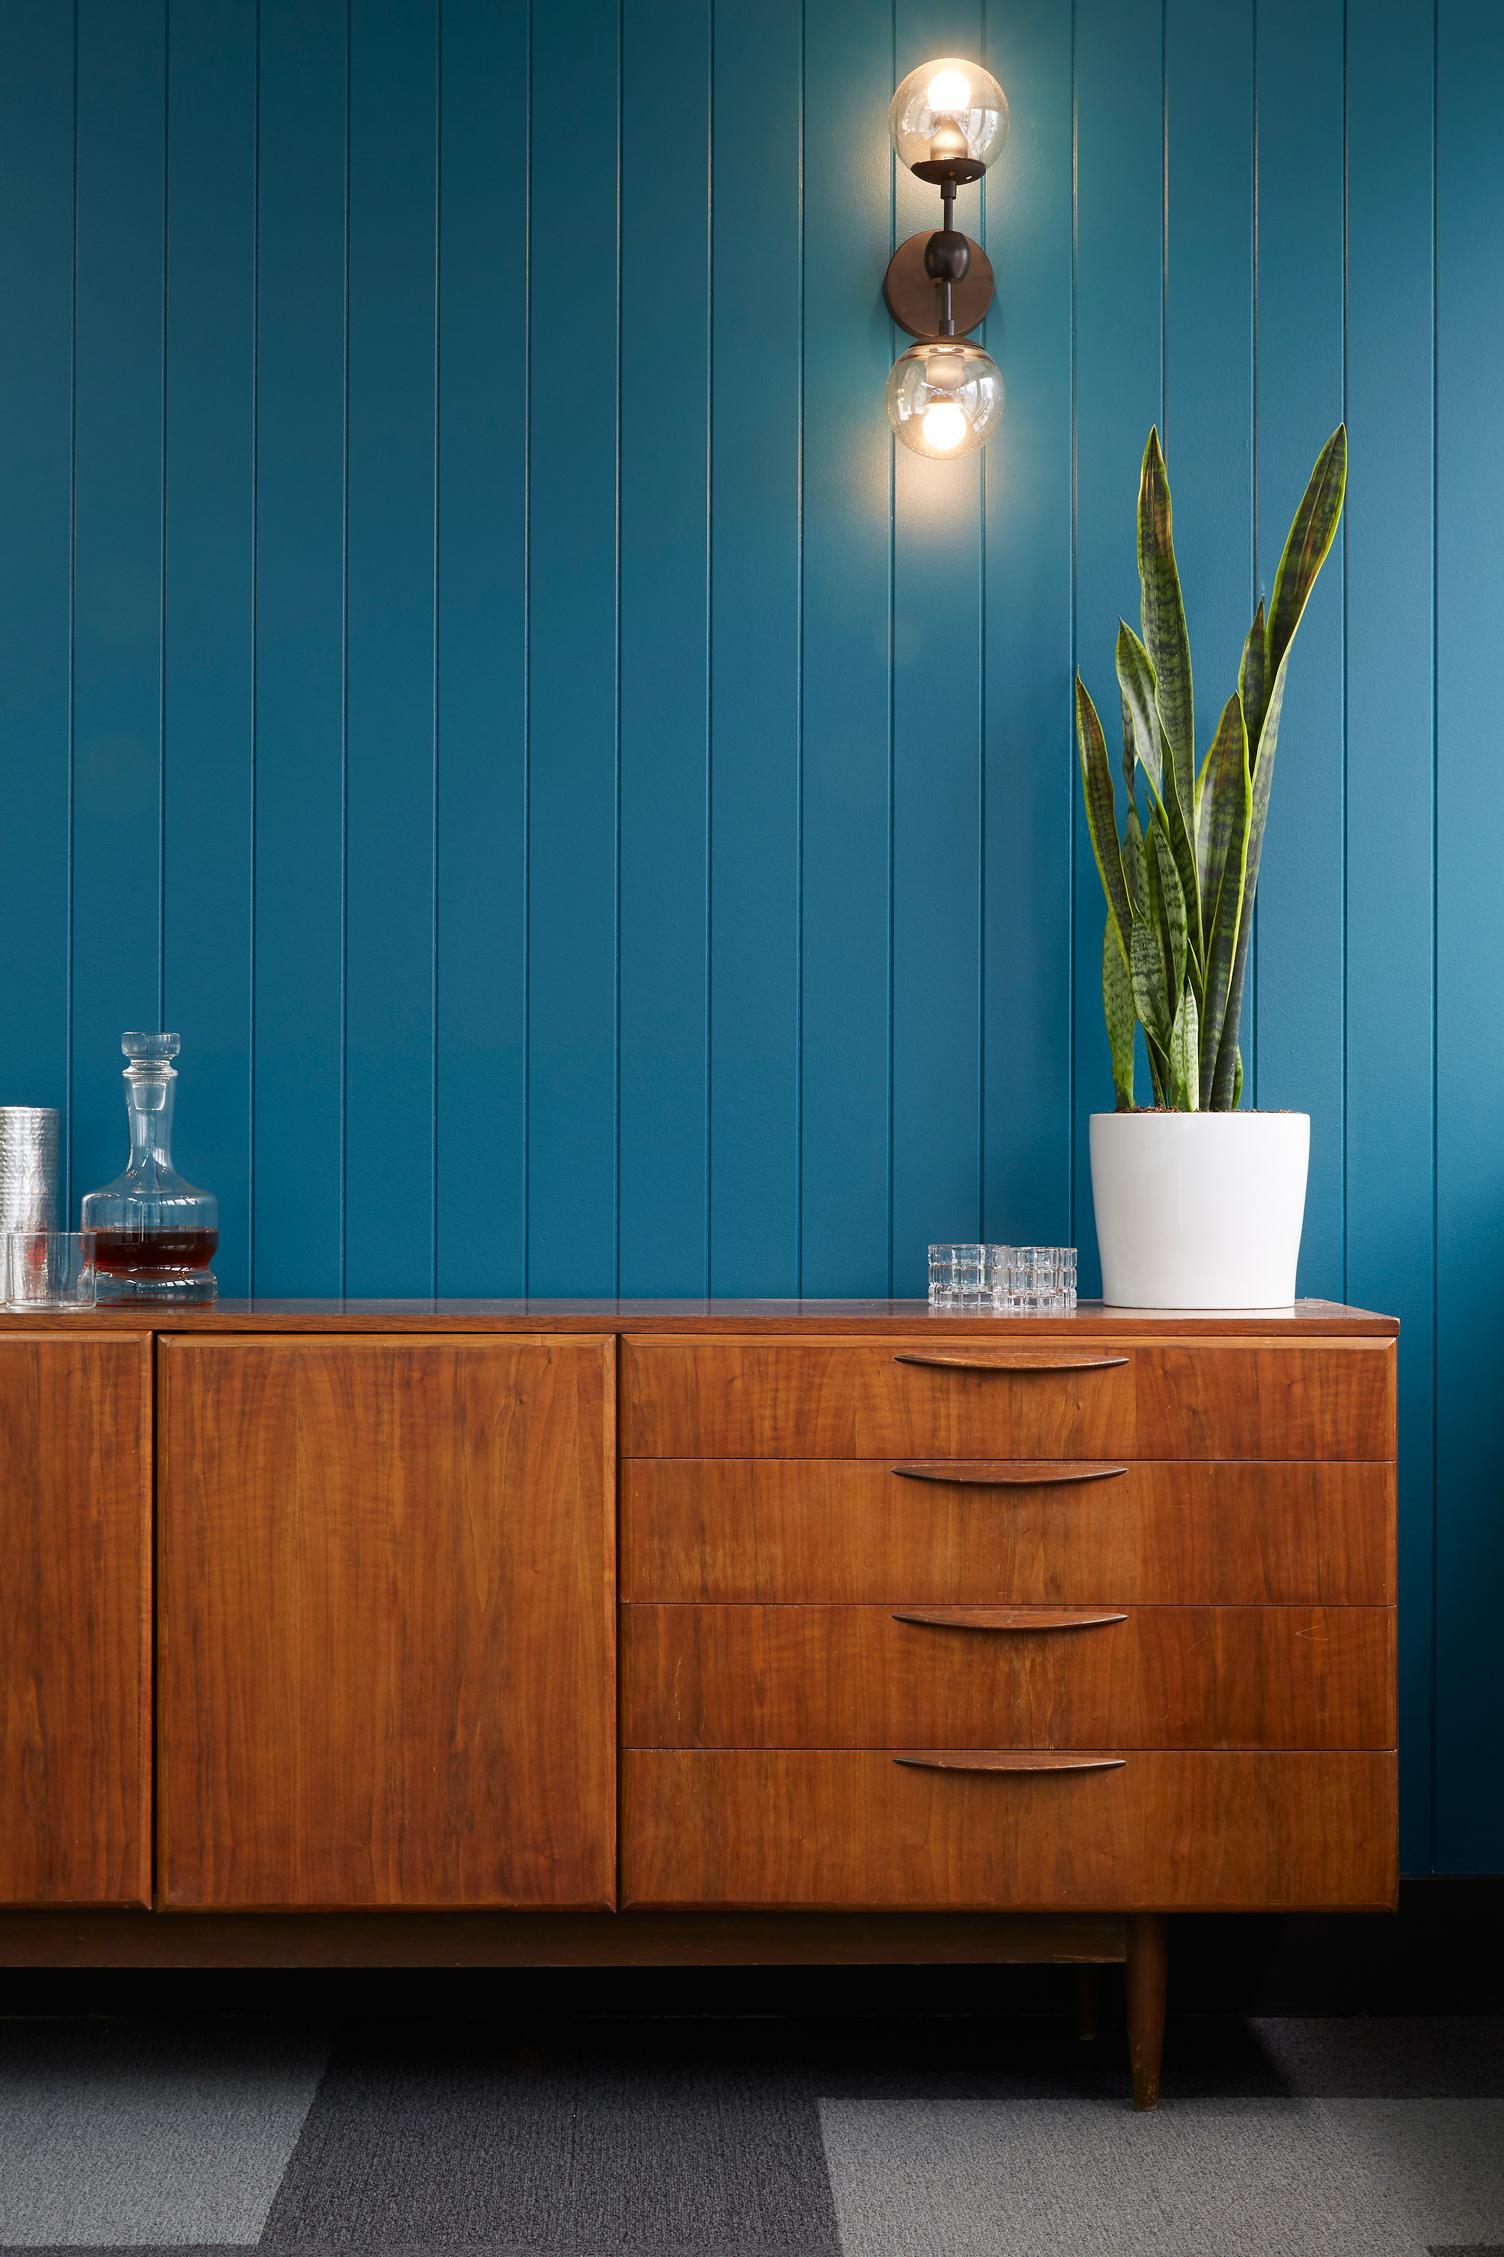 interiors photography_CThree_Agency_037.jpg